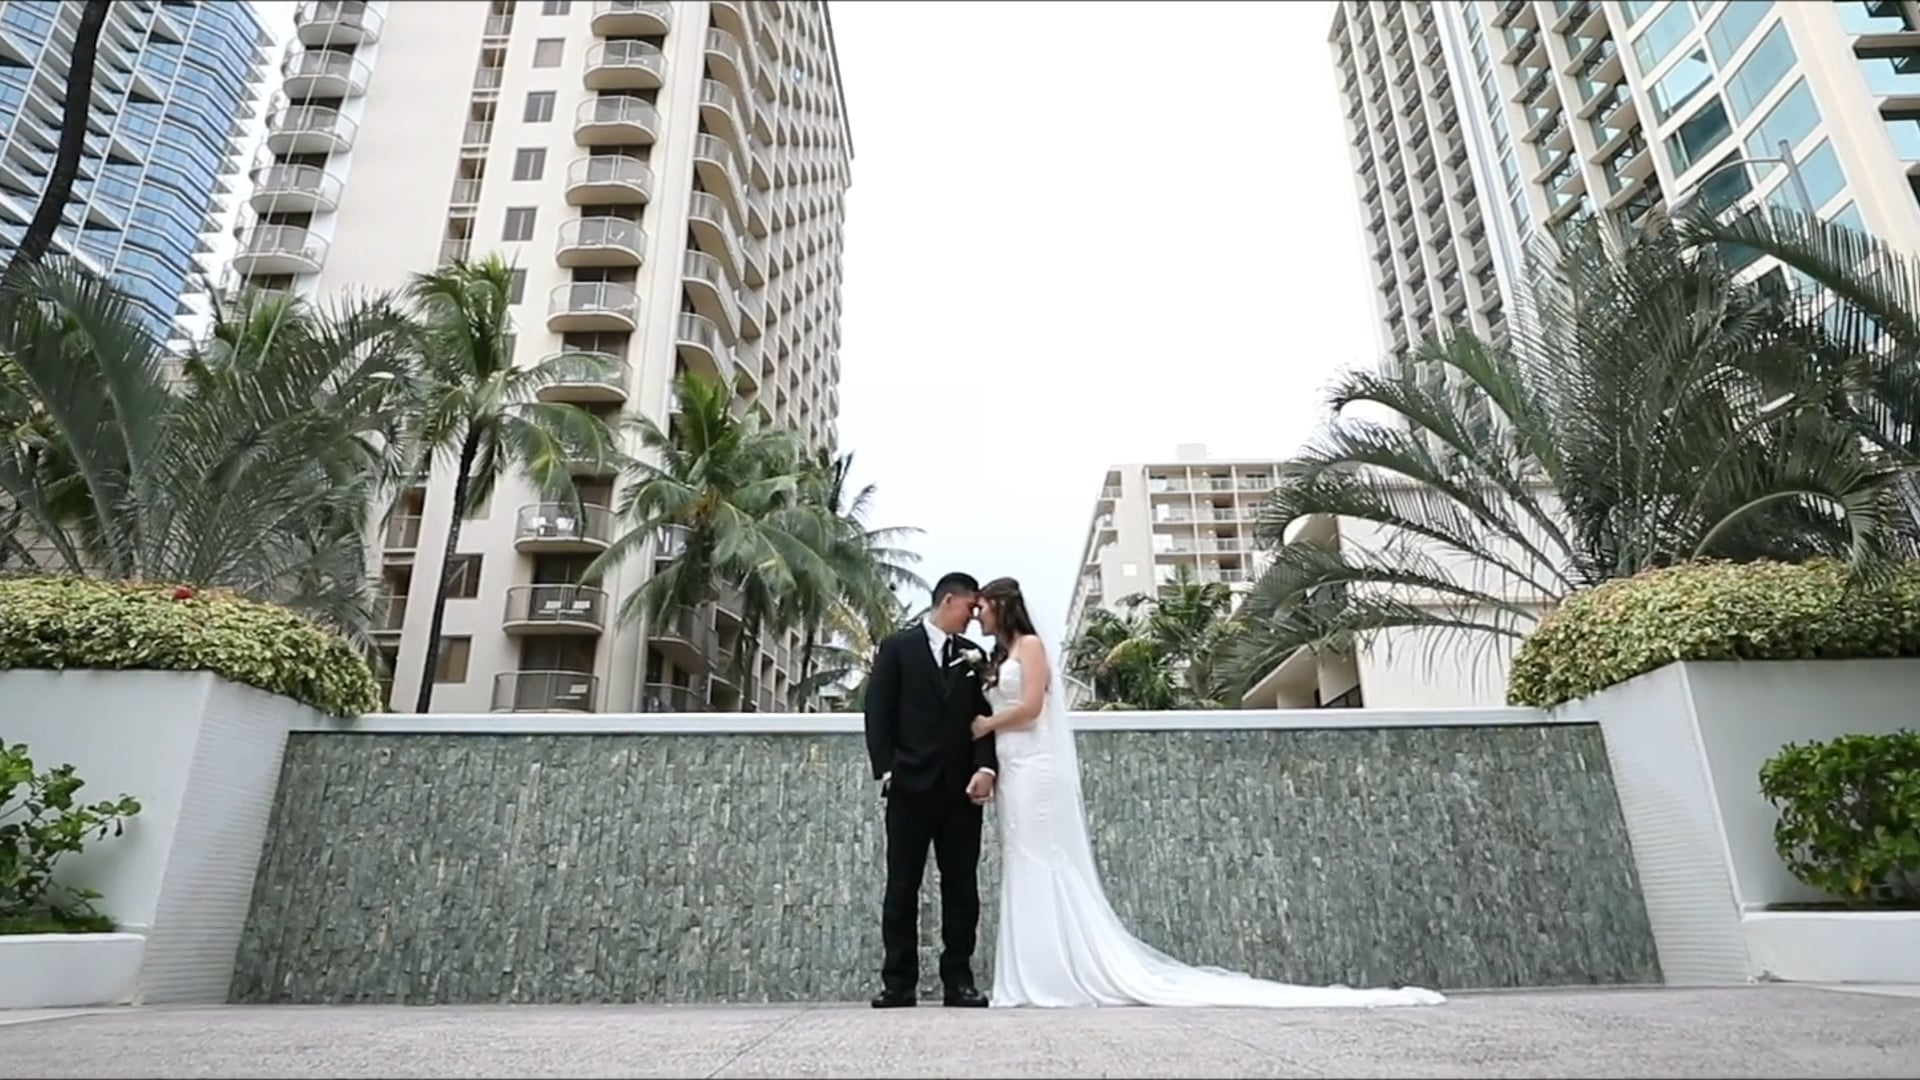 Shanna & Chris - Wedding Highlight